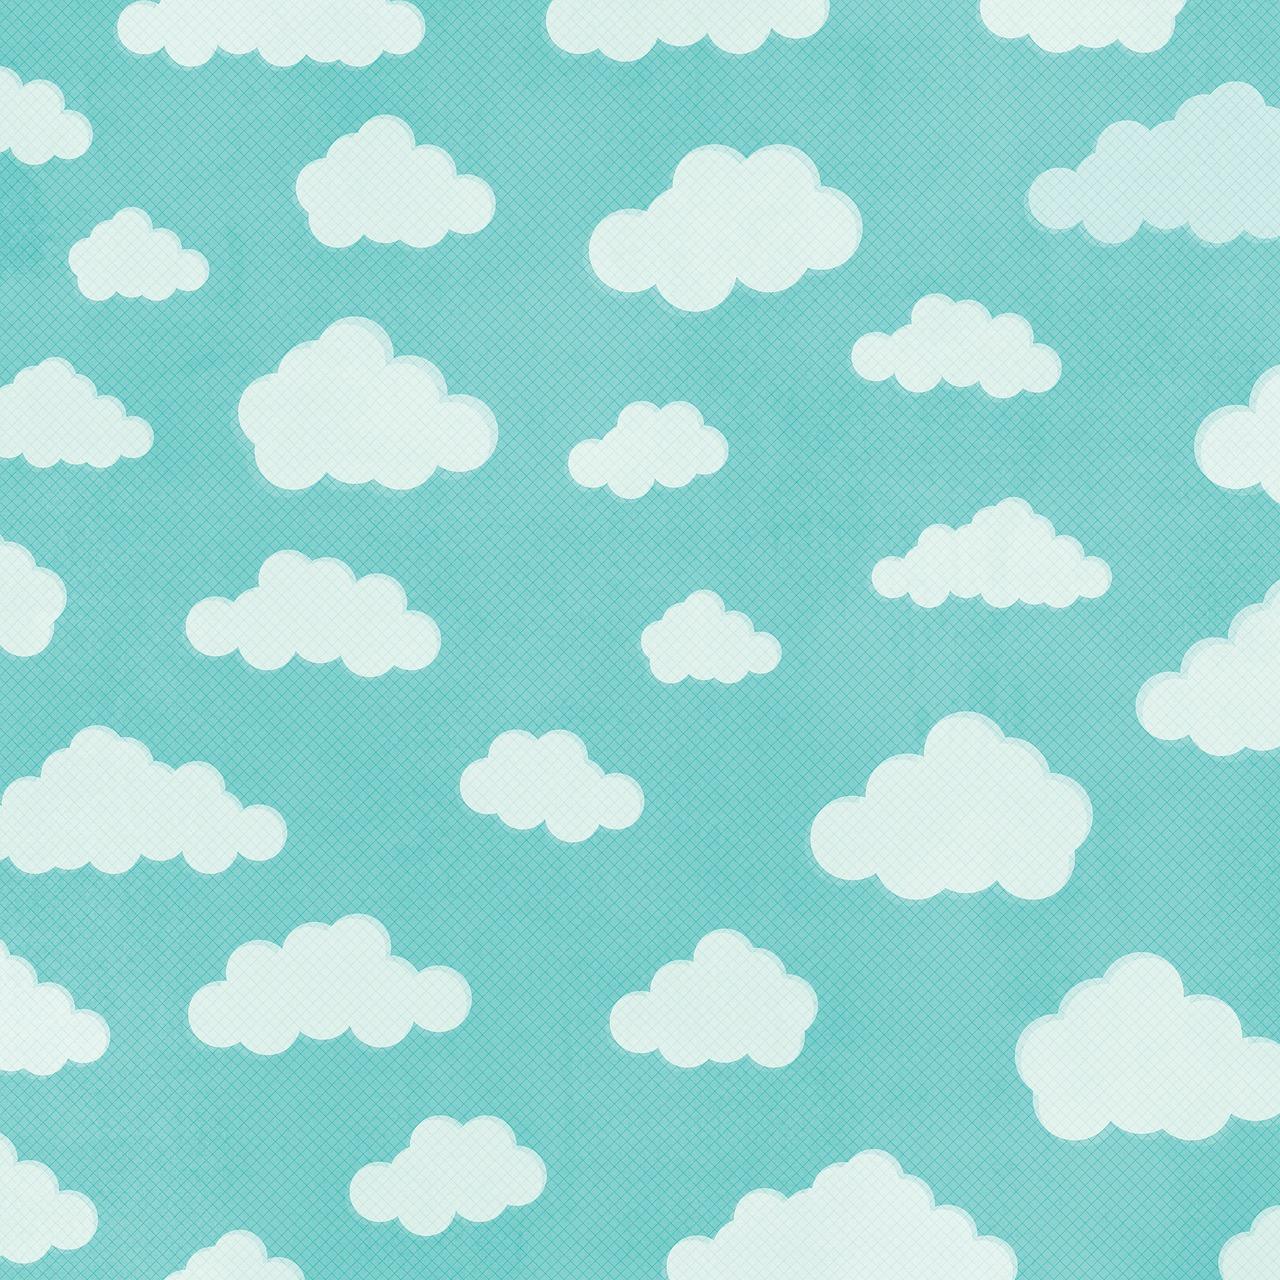 Paper Background Scrapbooking Paper Clouds Sky Digital Design Free Image From Needpix Com